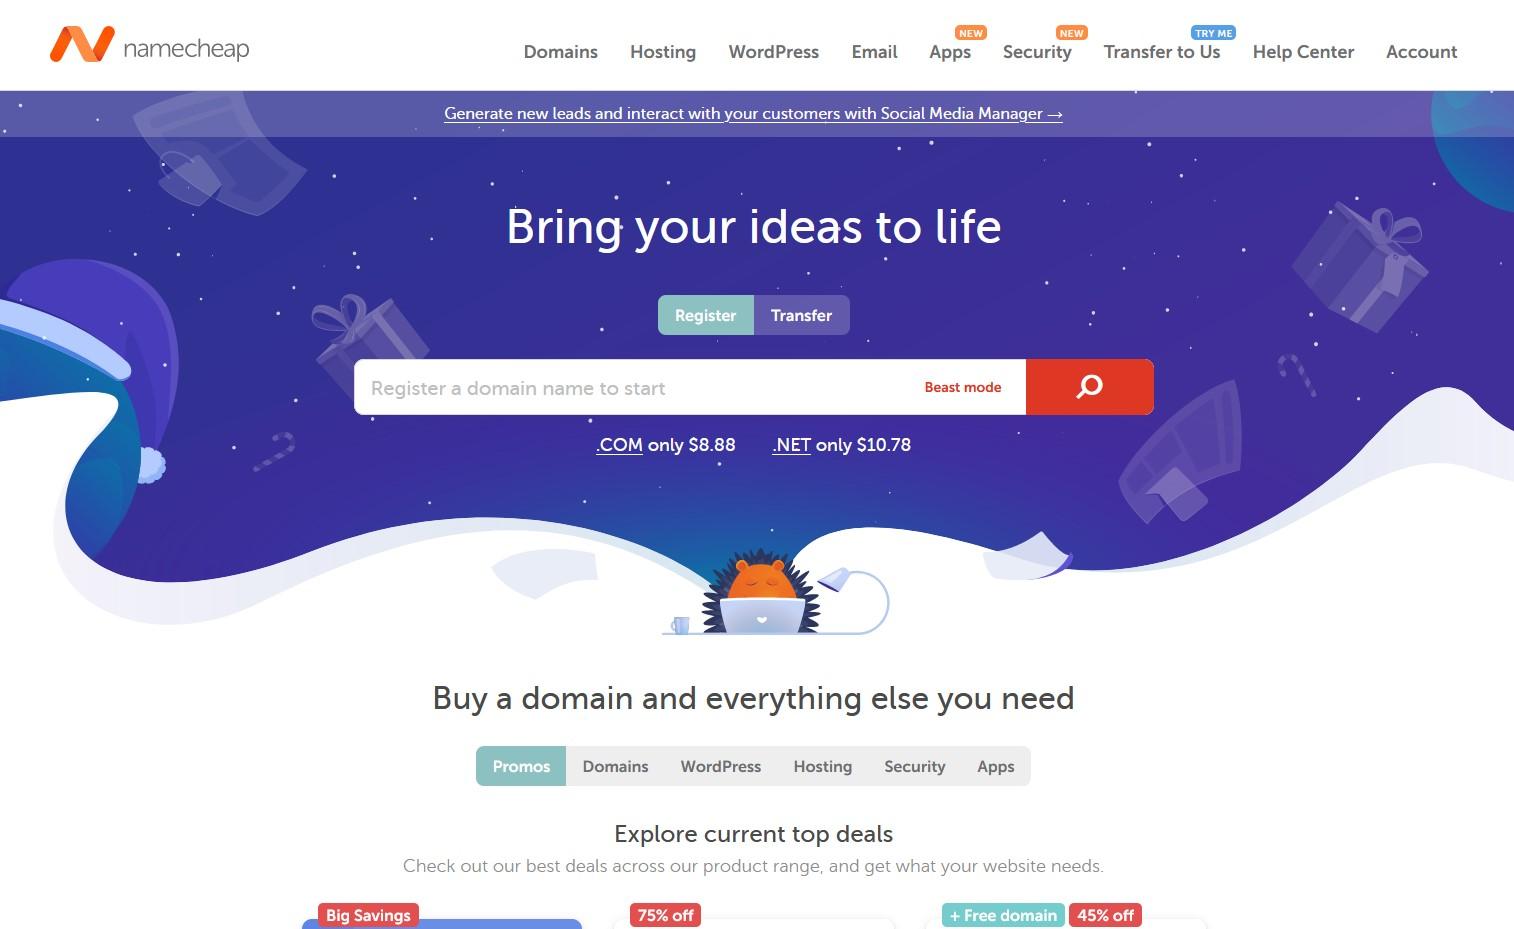 namecheap domain names